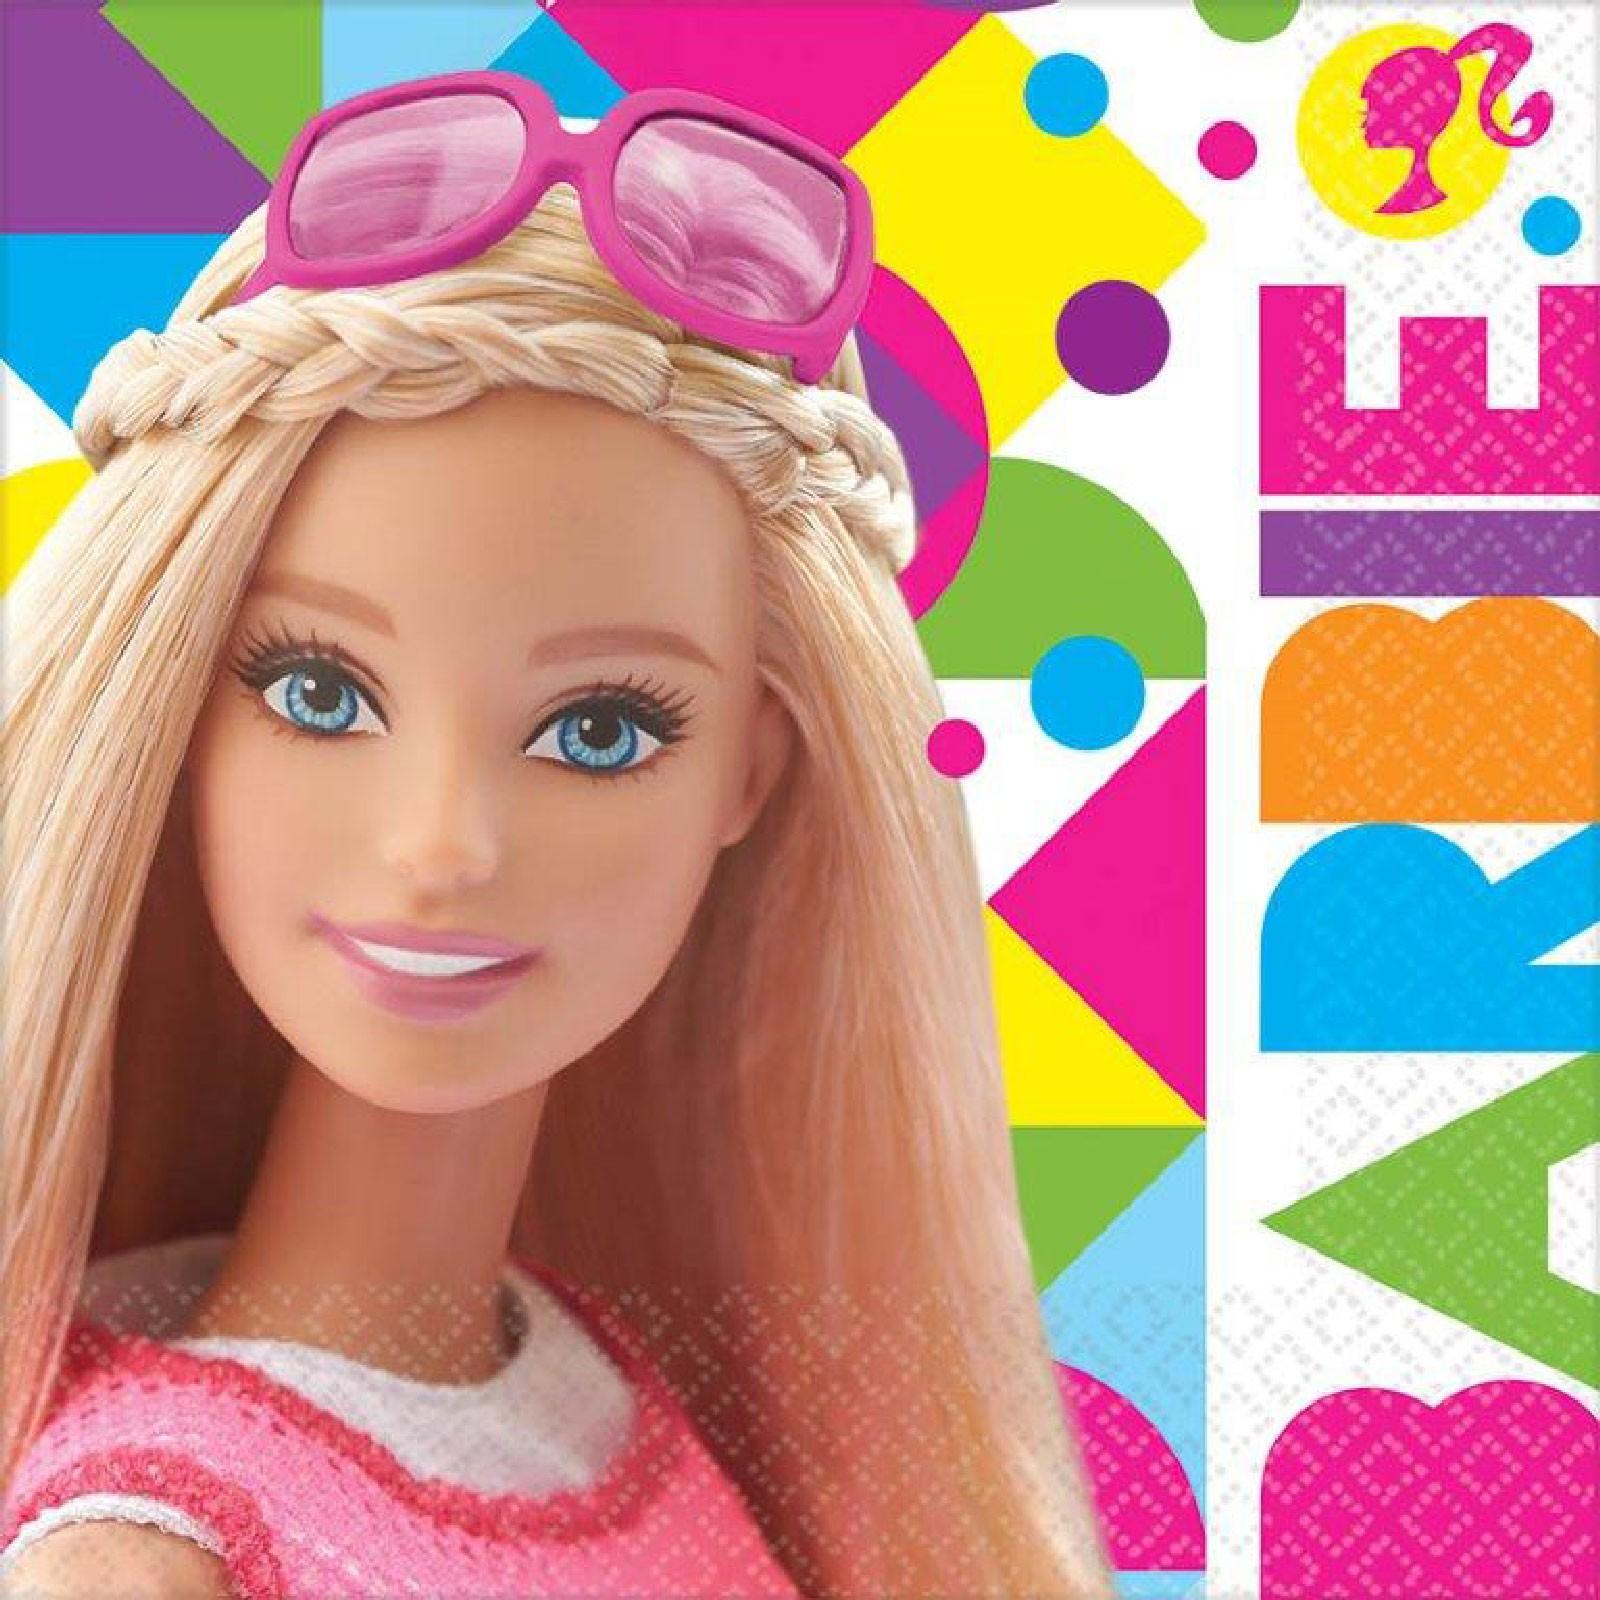 Салфетка Барби, 33 см 16 штукBarbie (Барби)<br>Салфетка Барби, 33 см 16 штук<br>